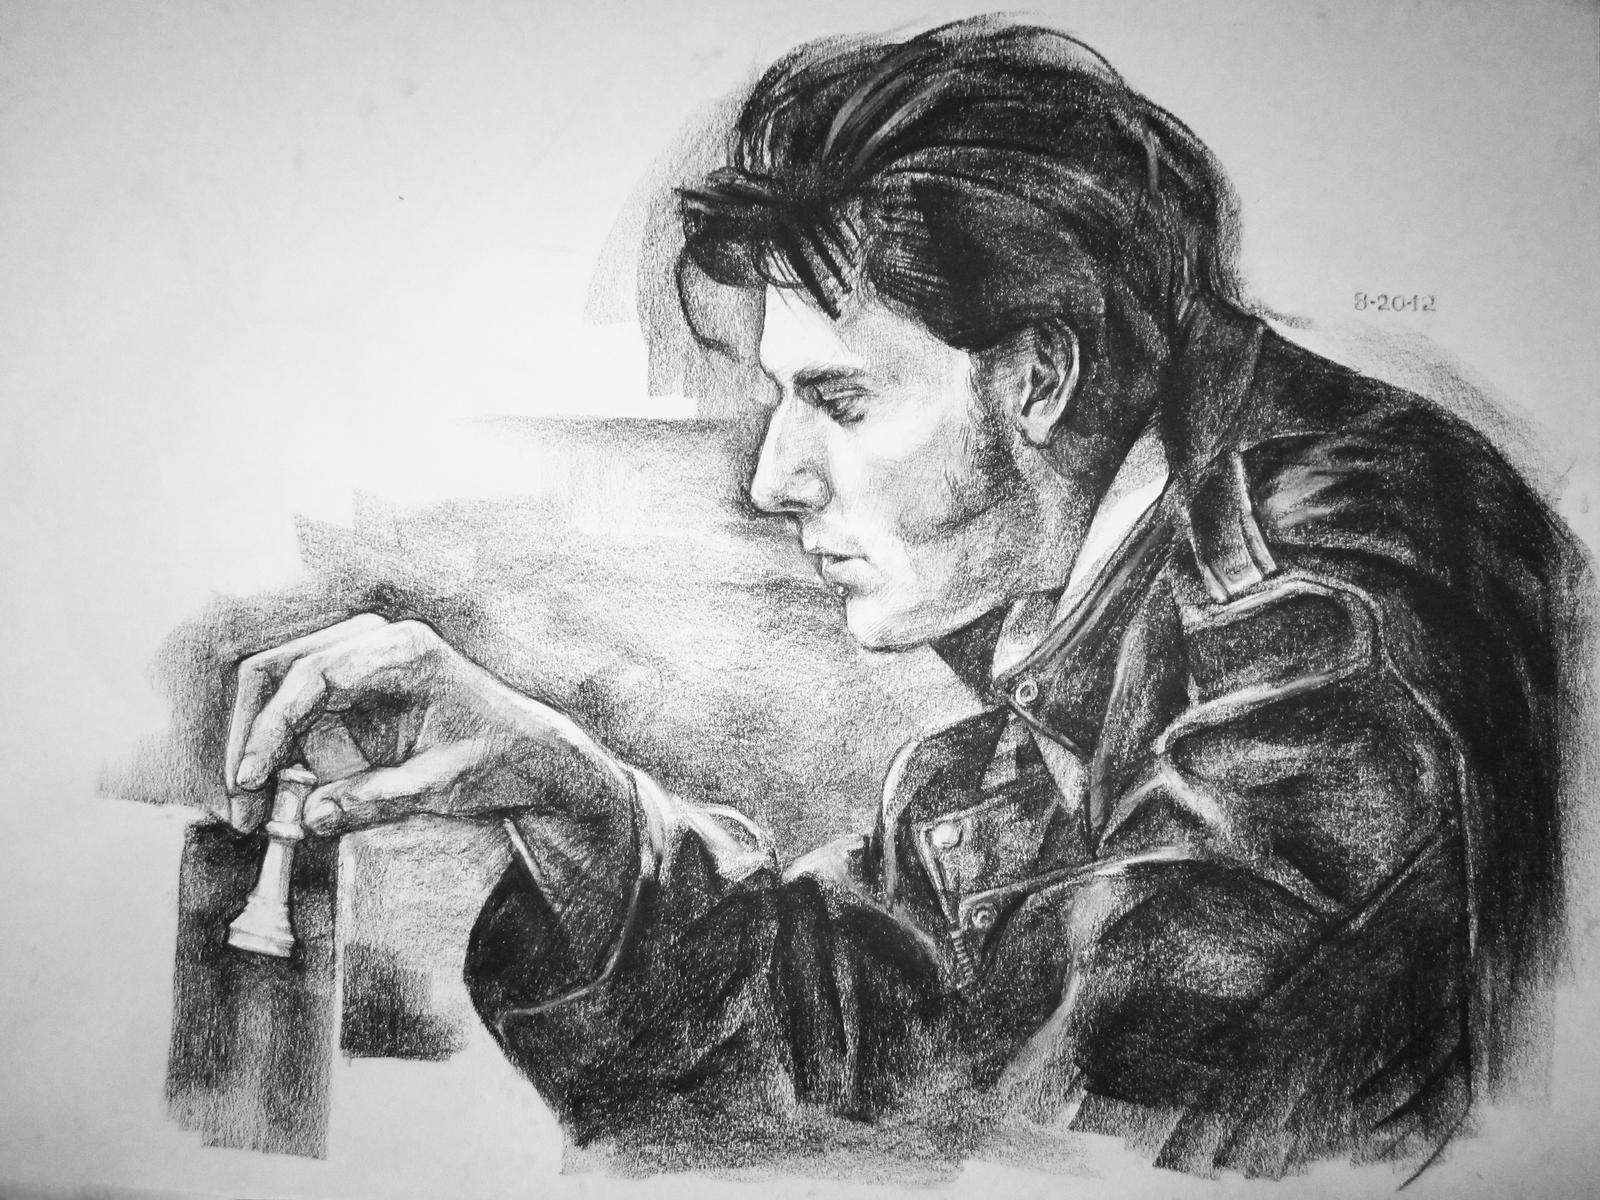 Chess by Cooooookies